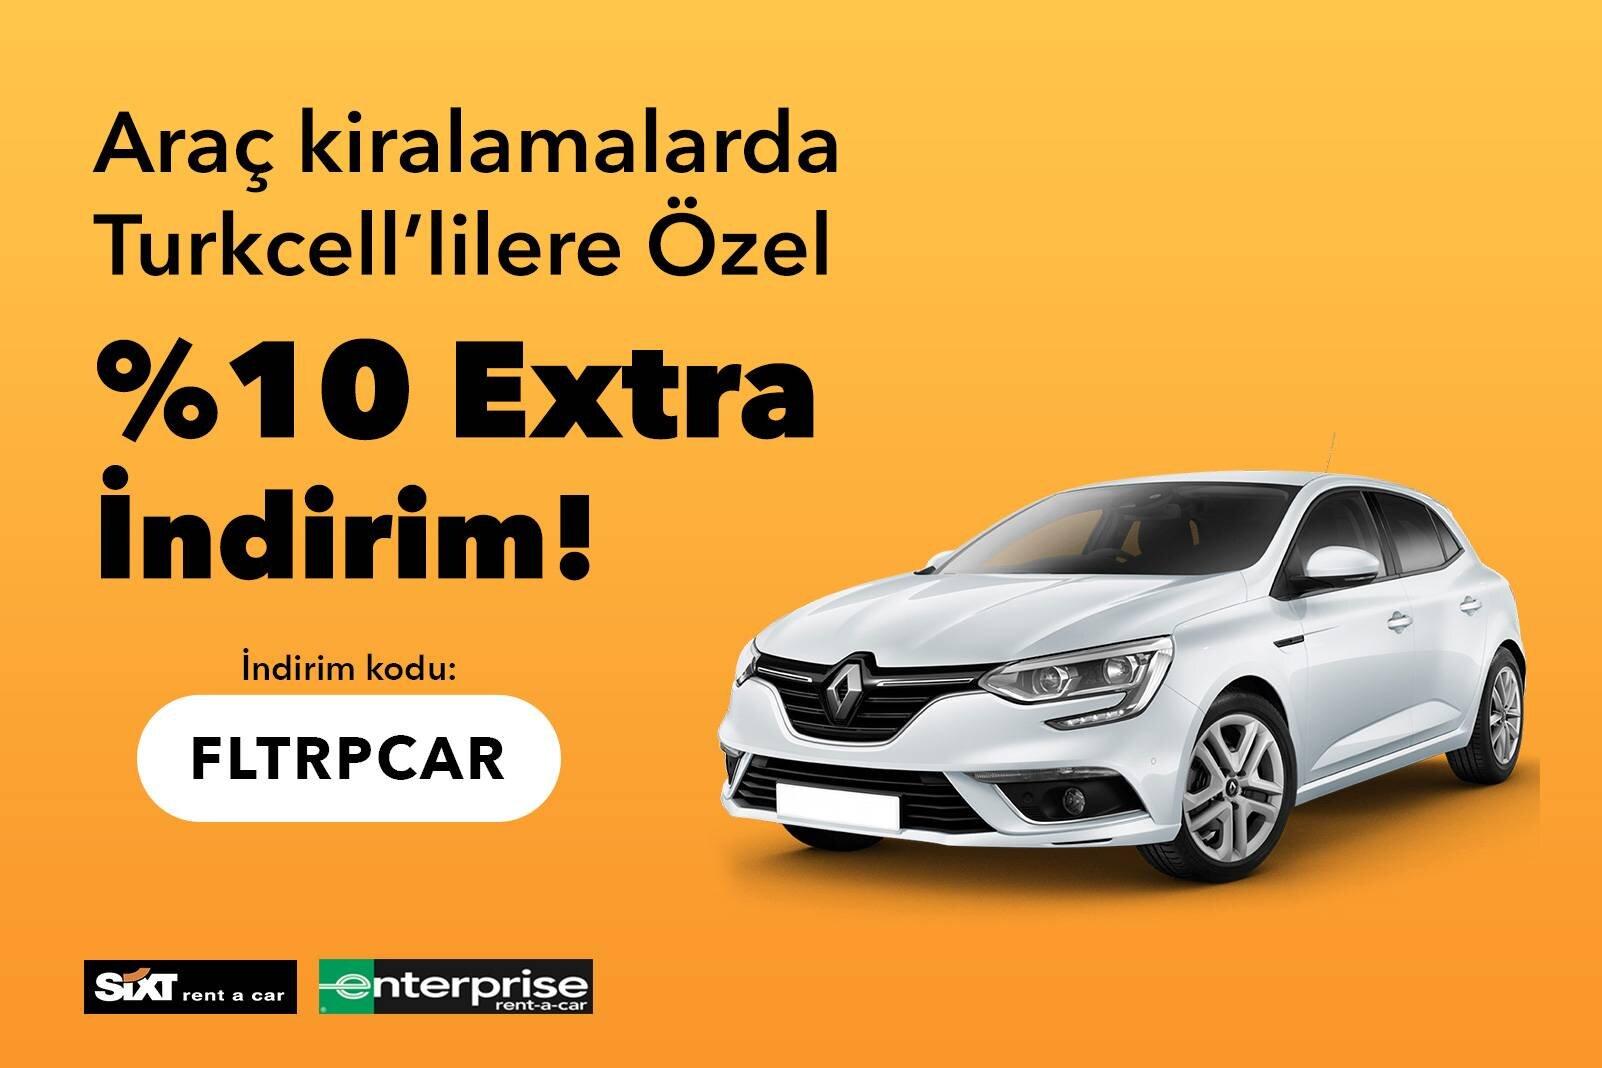 Araç Kiralamada Turkcell'lilere Özel Ekstra %10 İndirim